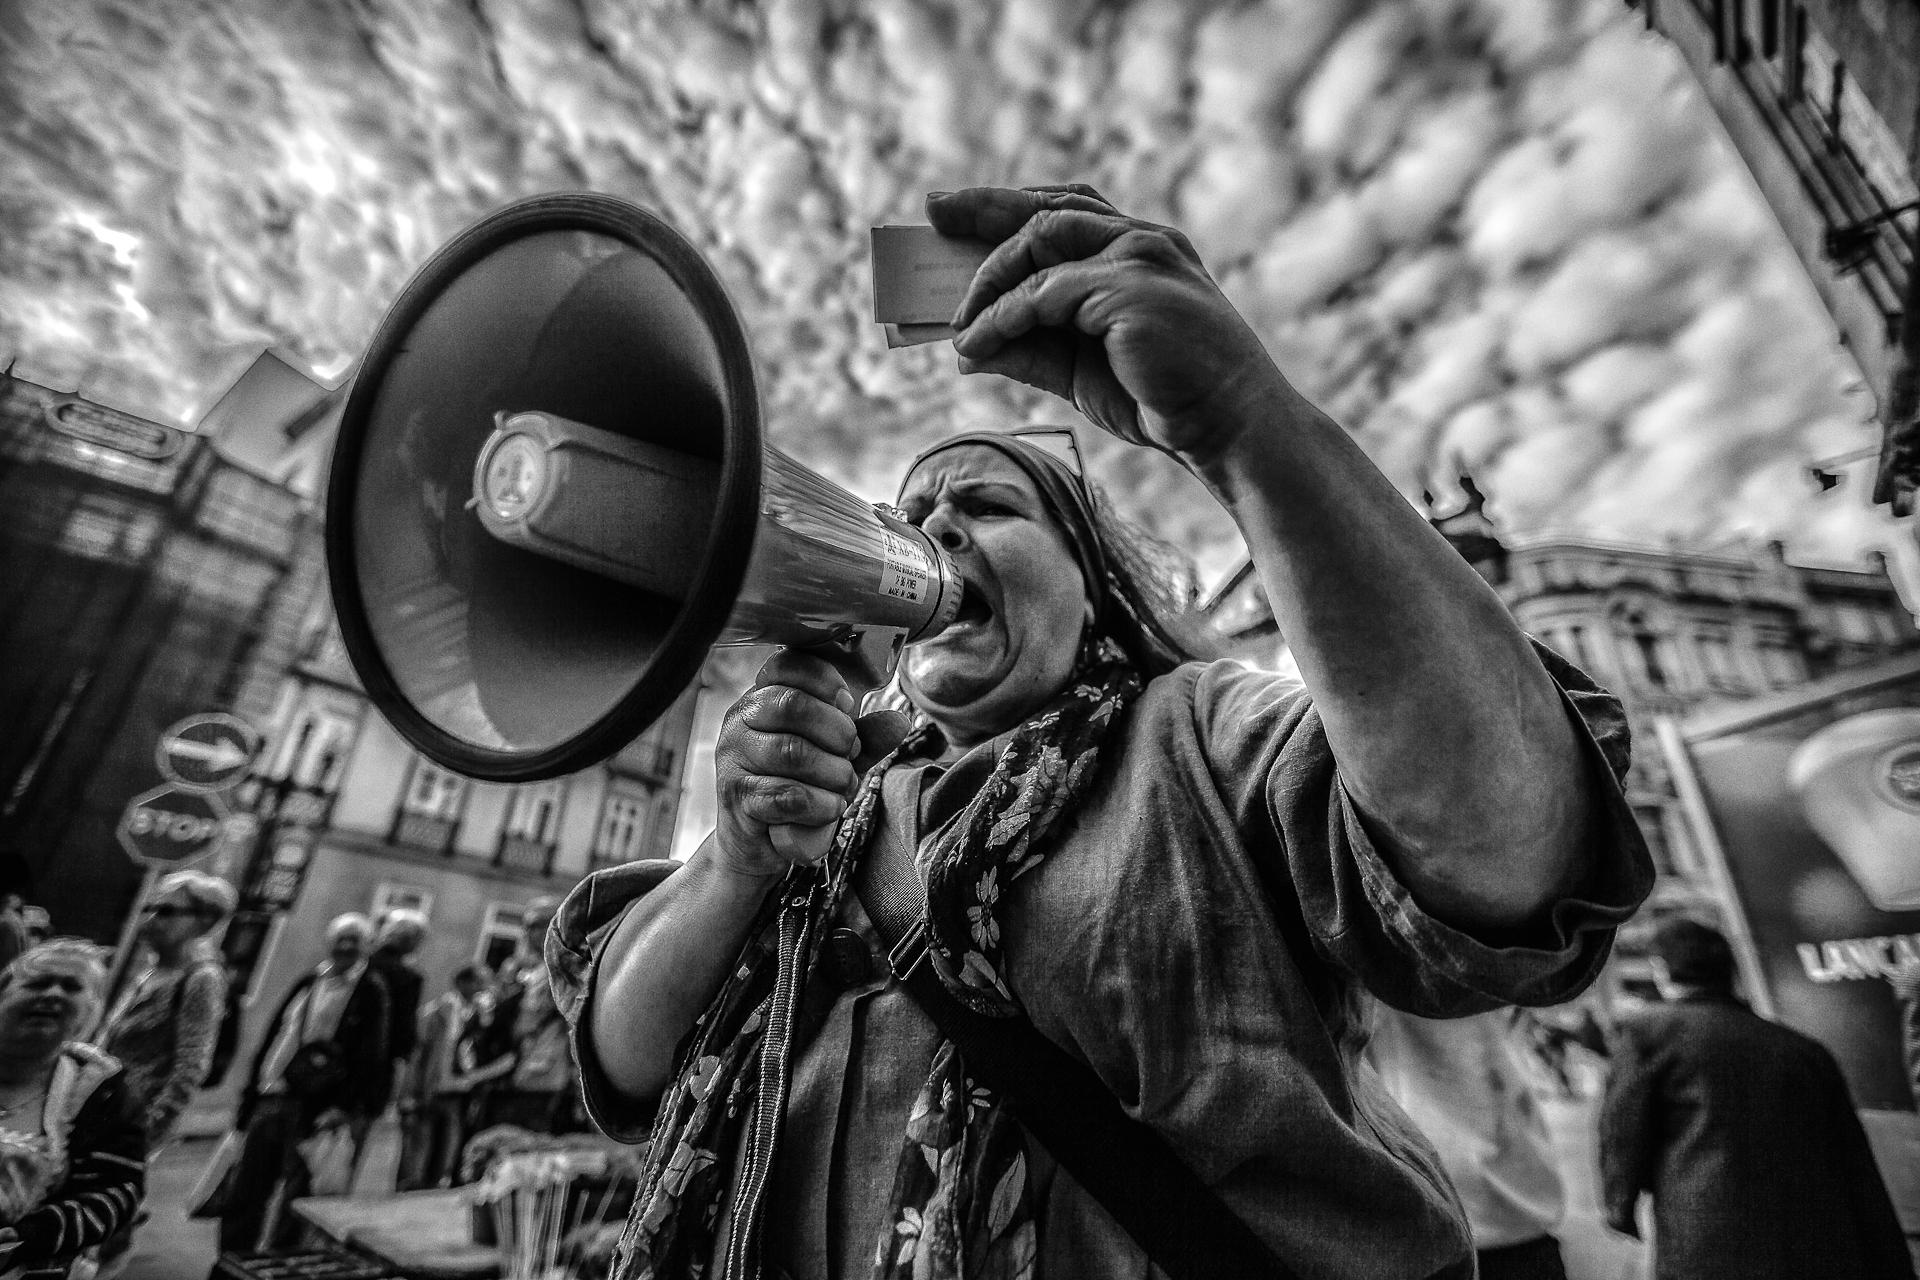 Photography Fotografia bonjourmolotov Andre Gigante 01